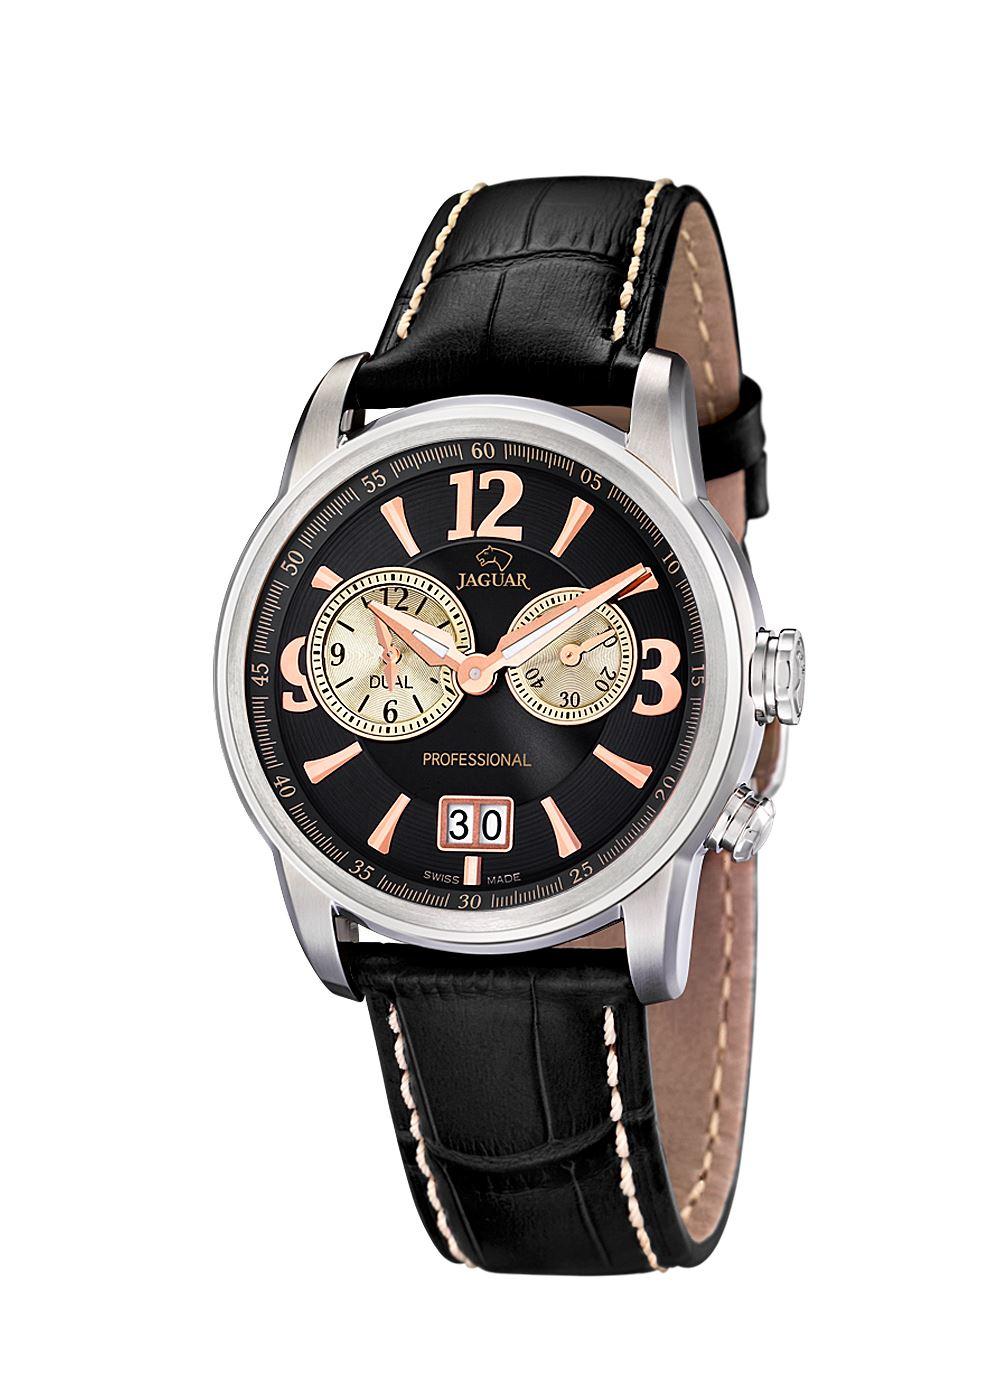 Jaguar & More - Ανδρικό Ελβετικό Ρολόι JAGUAR